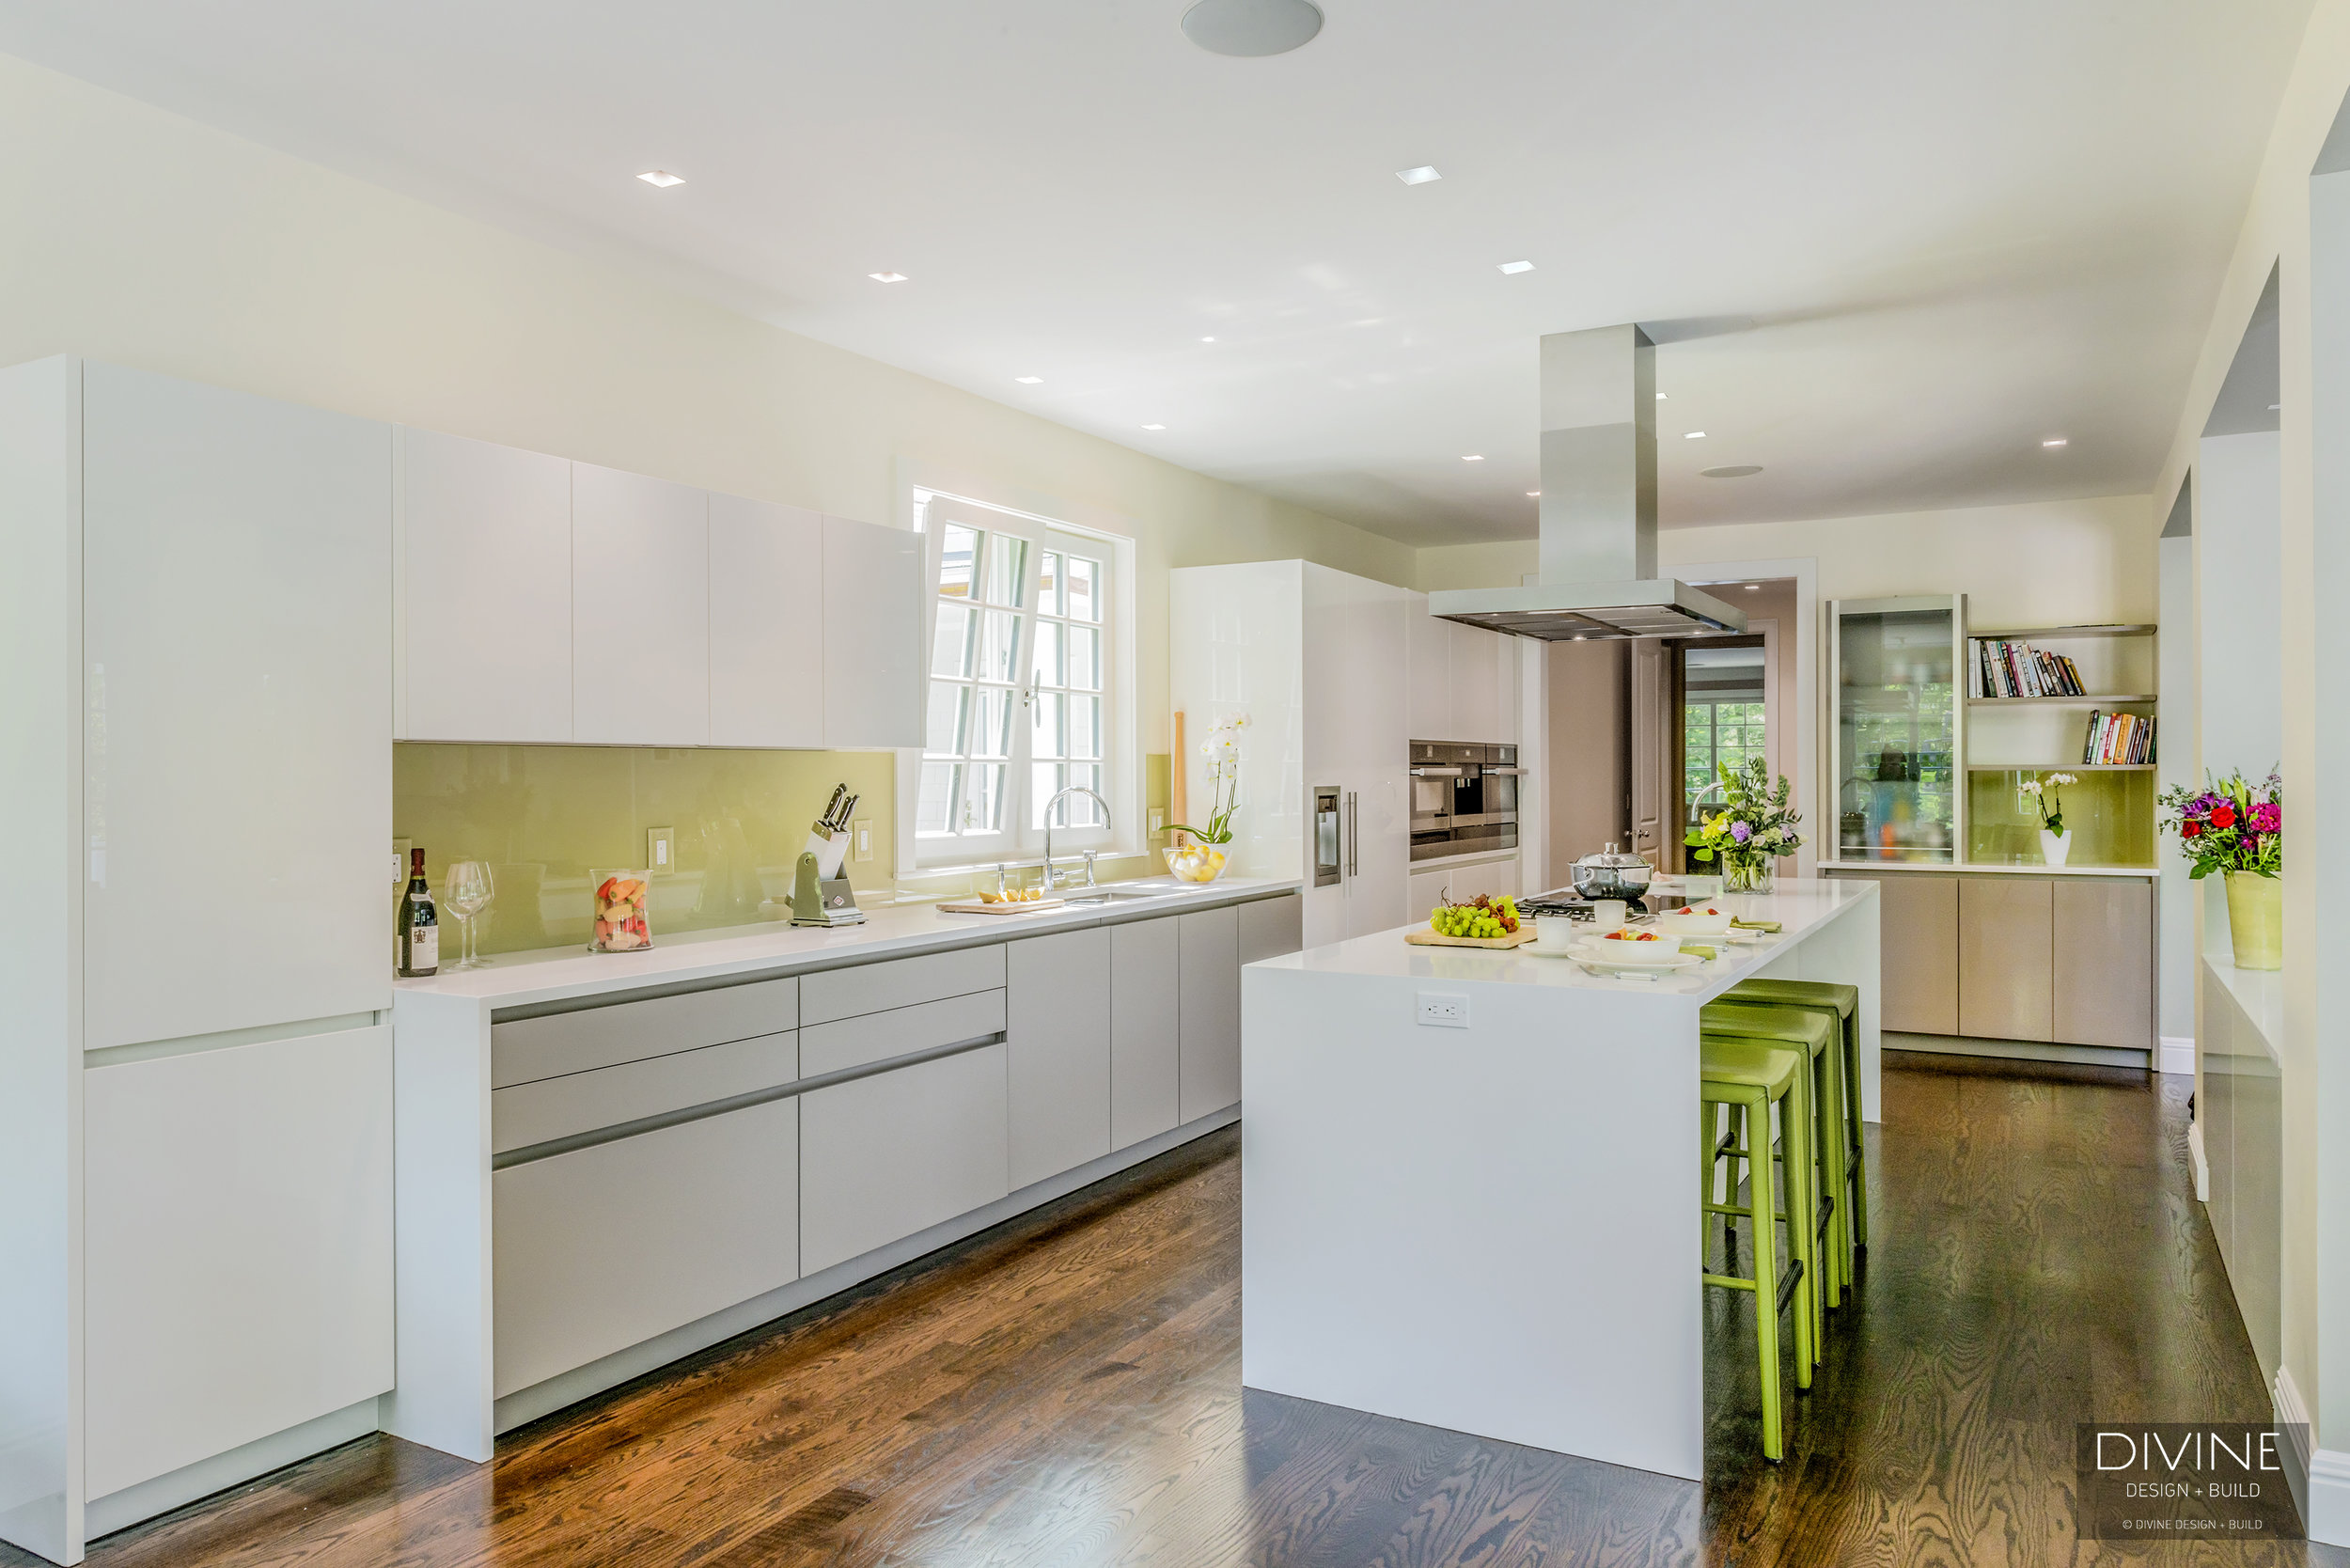 Using Green in Kitchen or Bathroom Design — Divine Design+Build